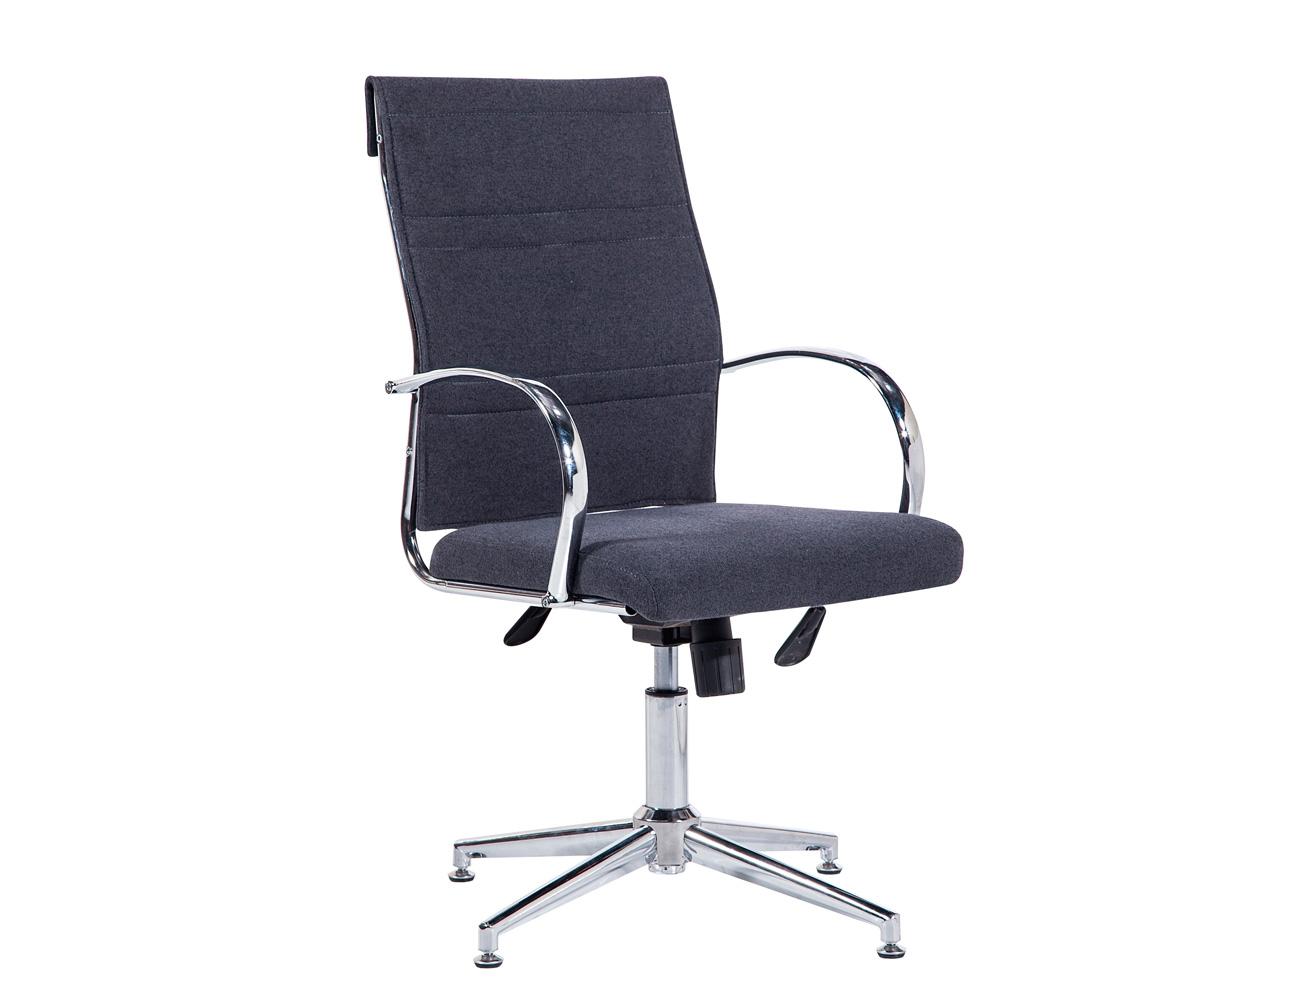 Silla despacho oficina apoya brazos gris marengo